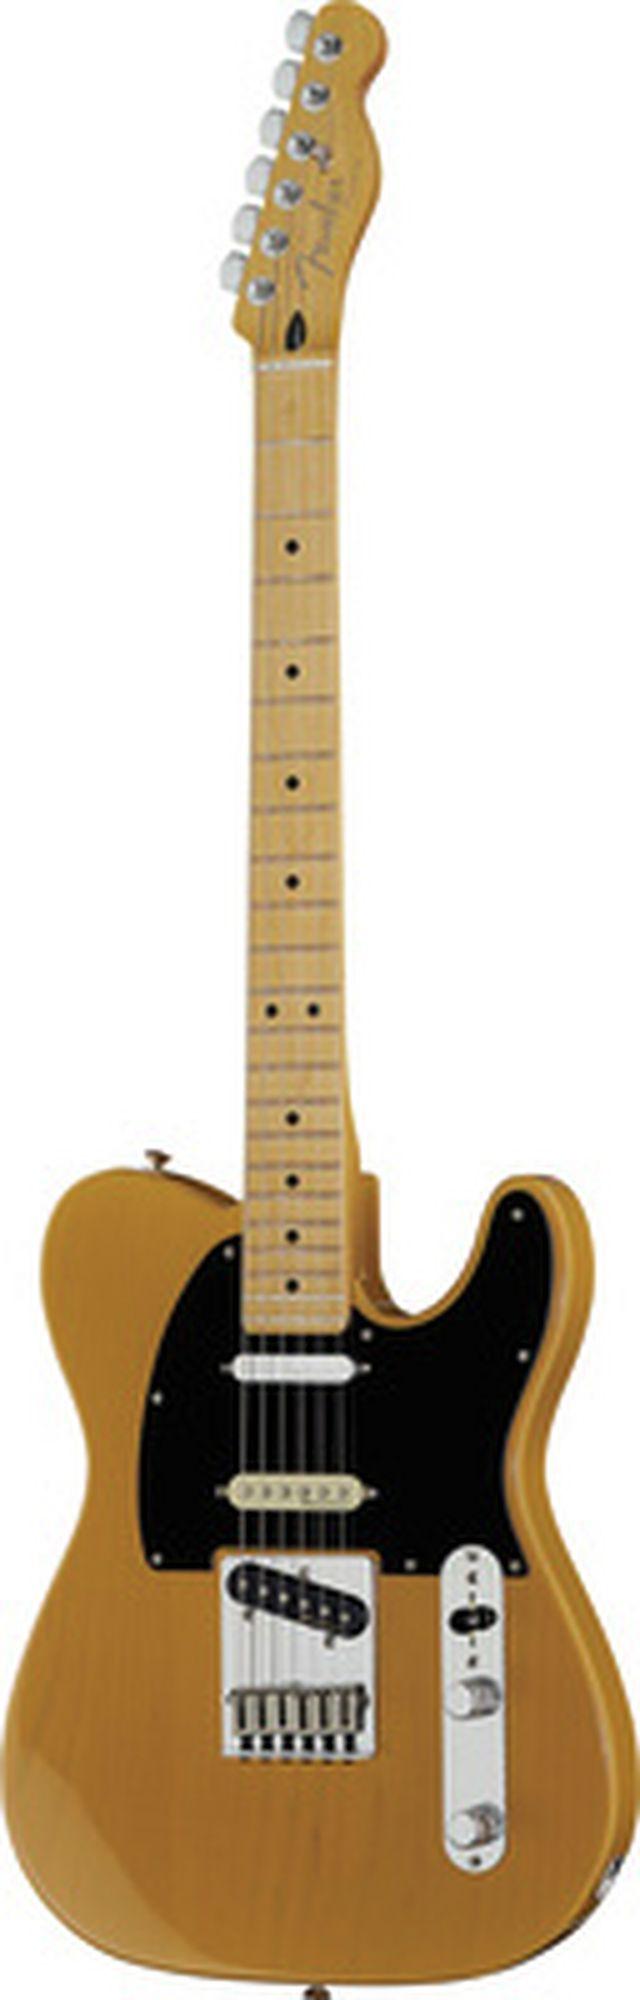 Fender Player Plus Nashv. MN Tele BB